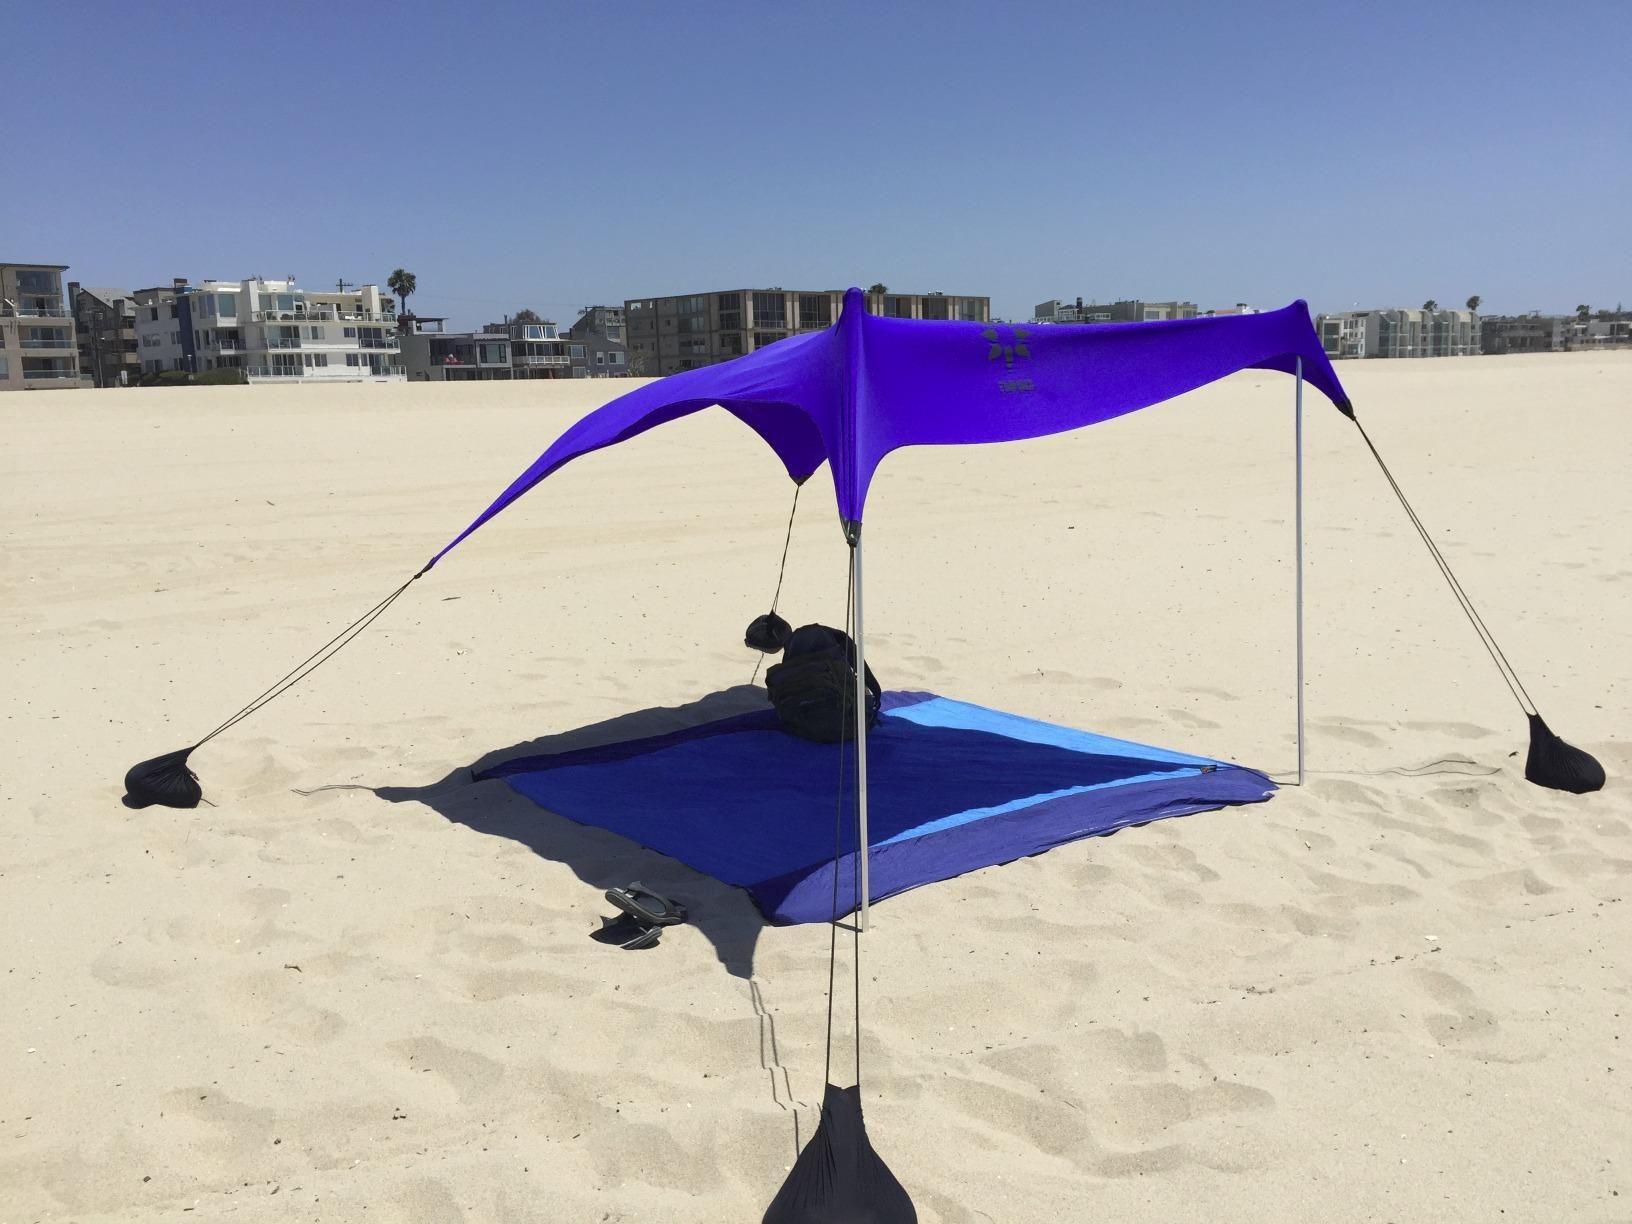 Amazon.com: Beach Tent with Sand Anchor, Portable Canopy